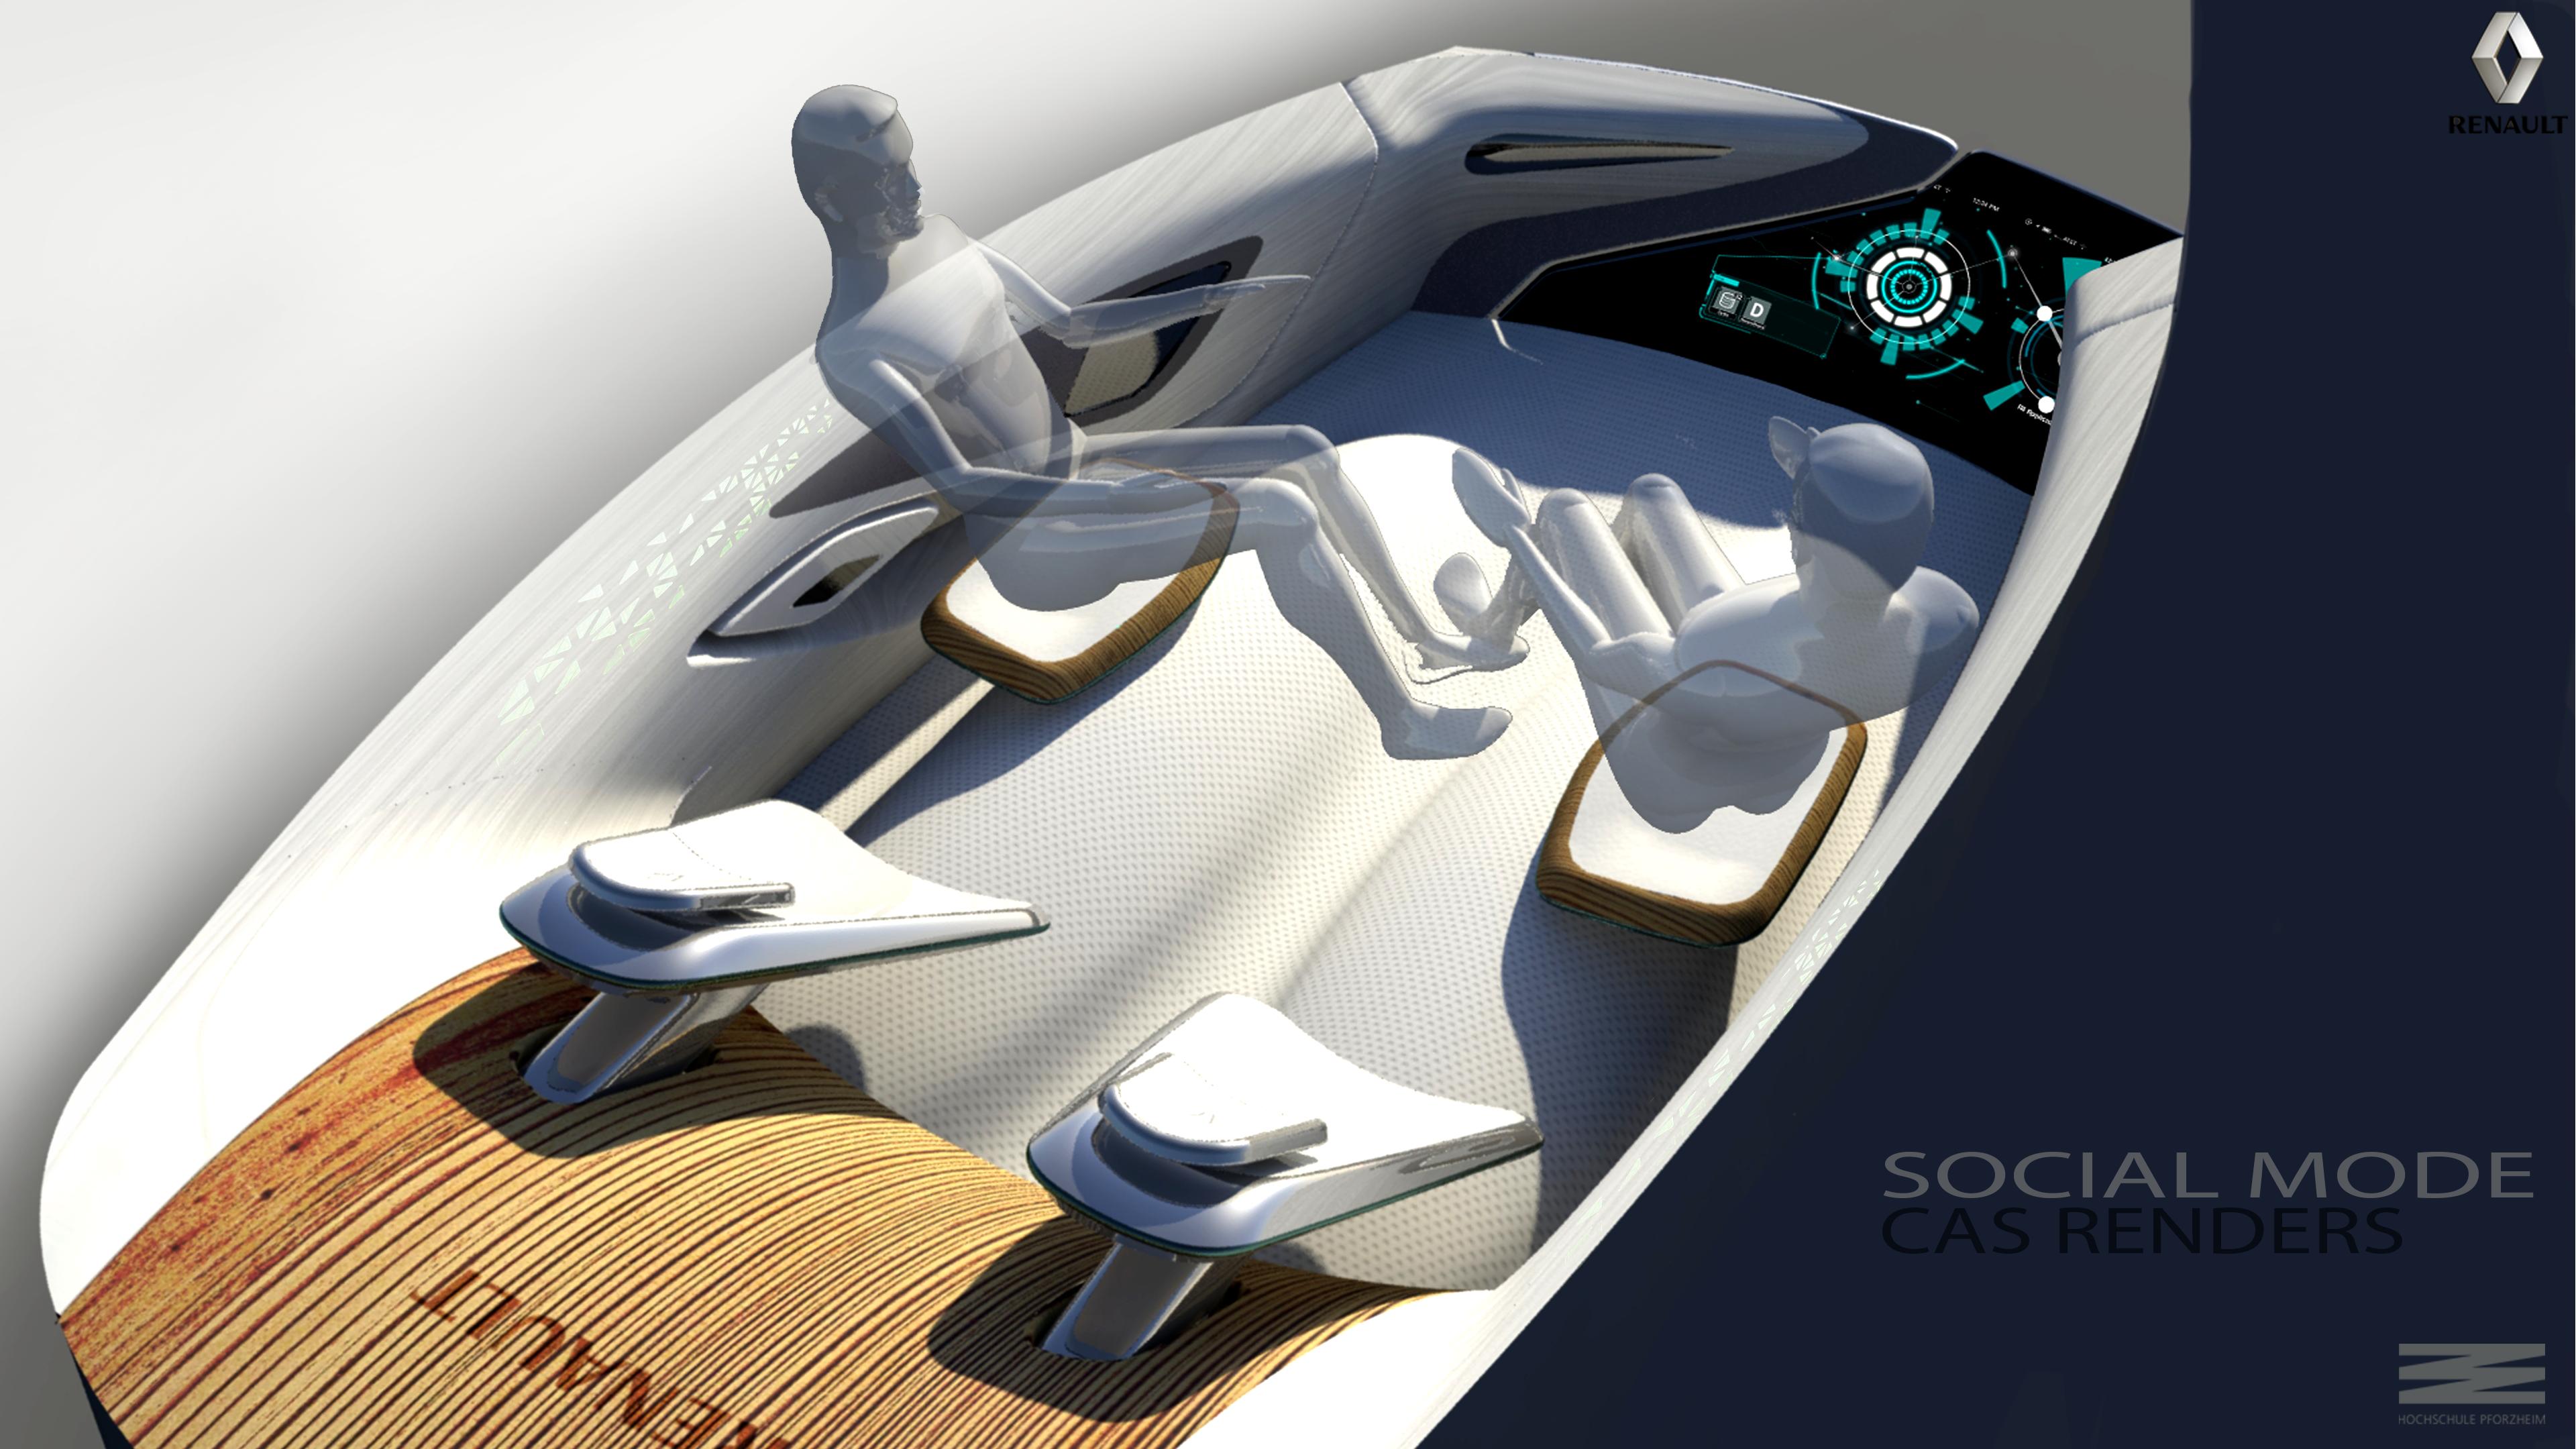 Impressionen Degree Show Summer 2015 Design Pf Blog Fakultat Fur Gestaltung Hs Pforzheim Car Interior Car Interior Design Luxury Car Interior